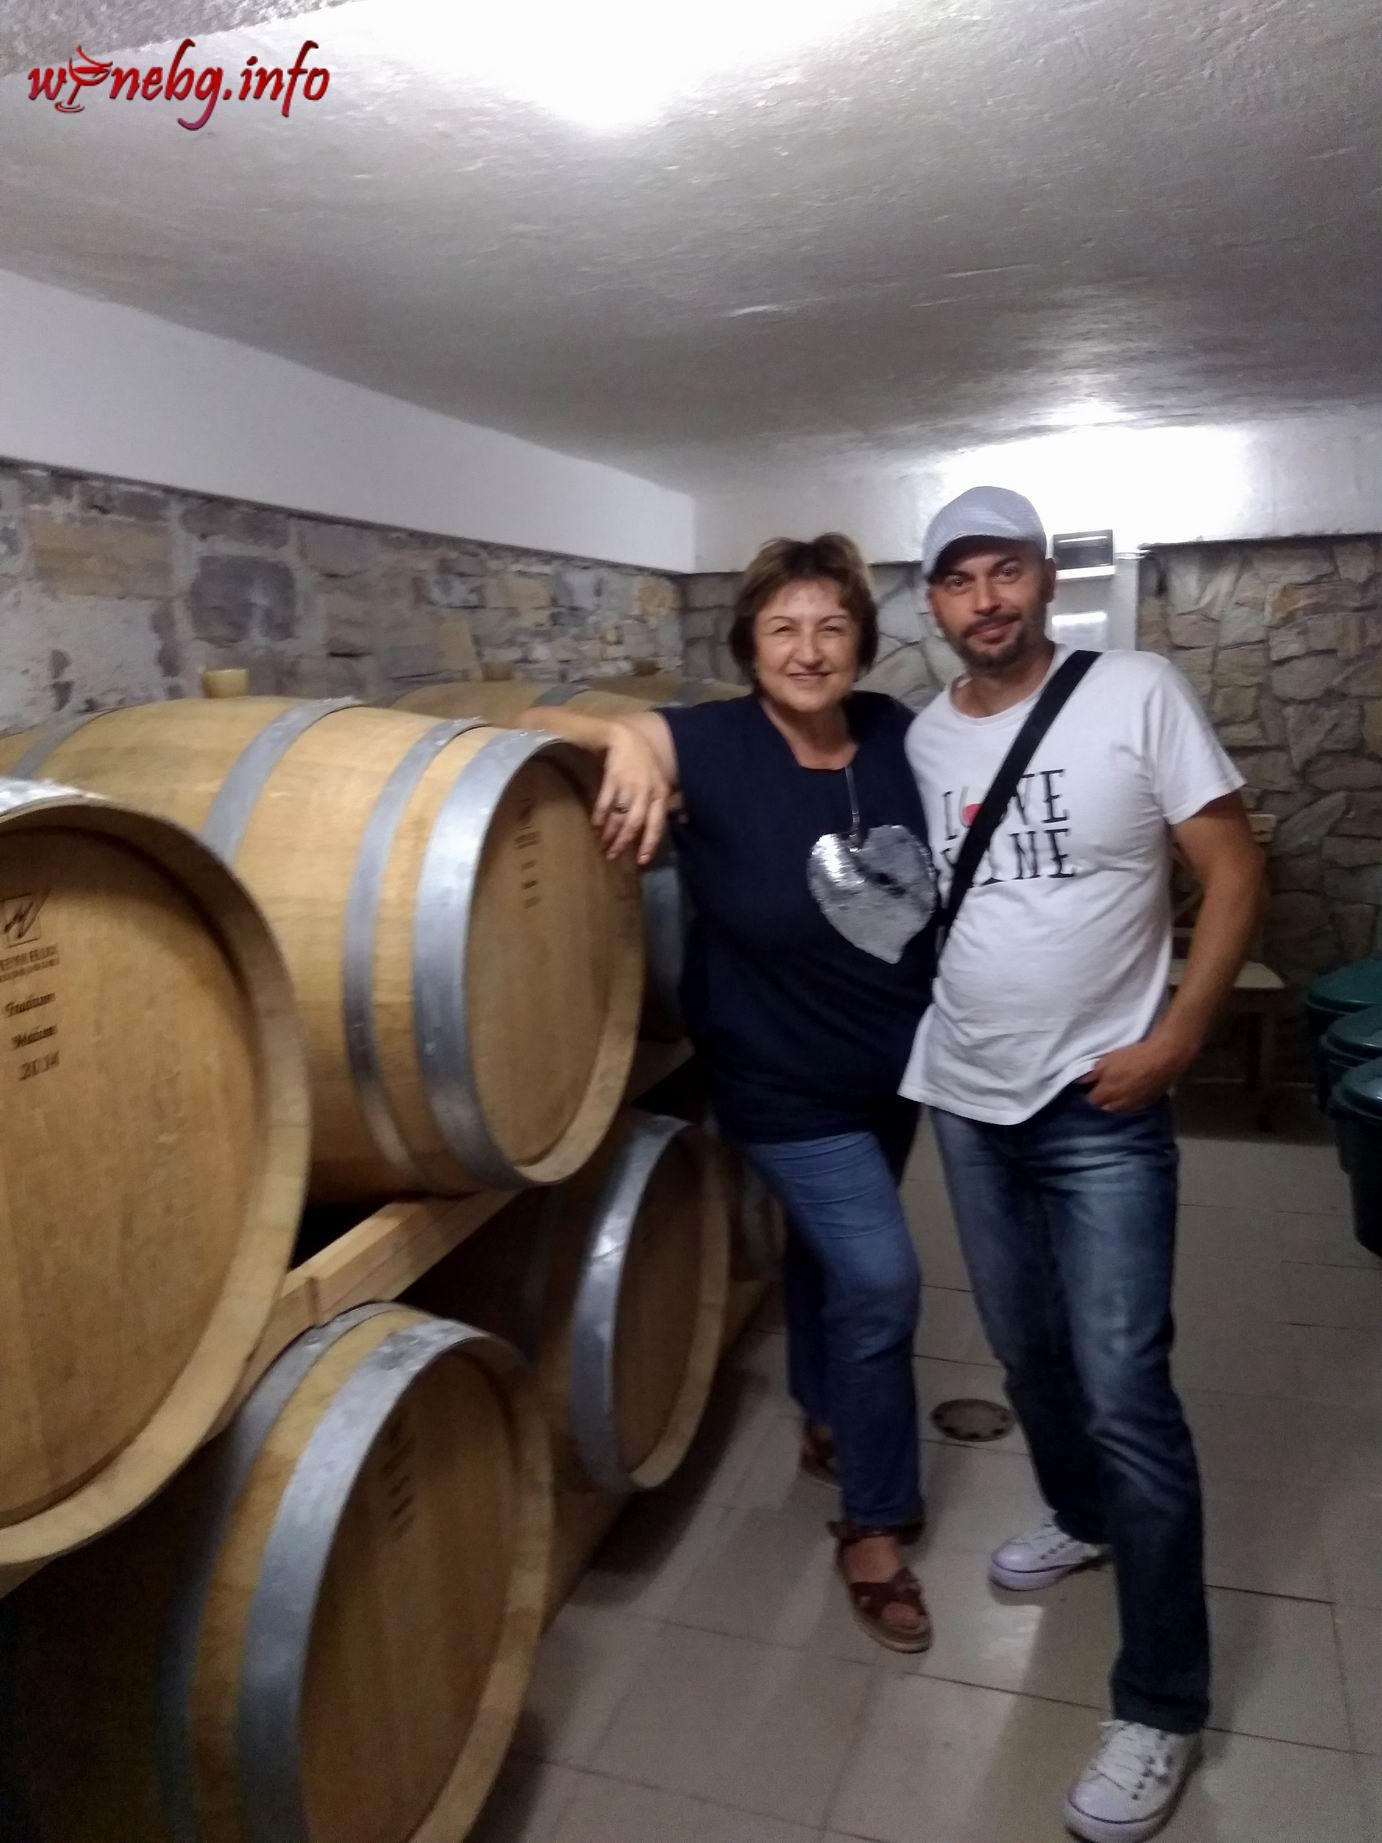 Snejana mutafchiyska-Roxs Winery - Winebg.info